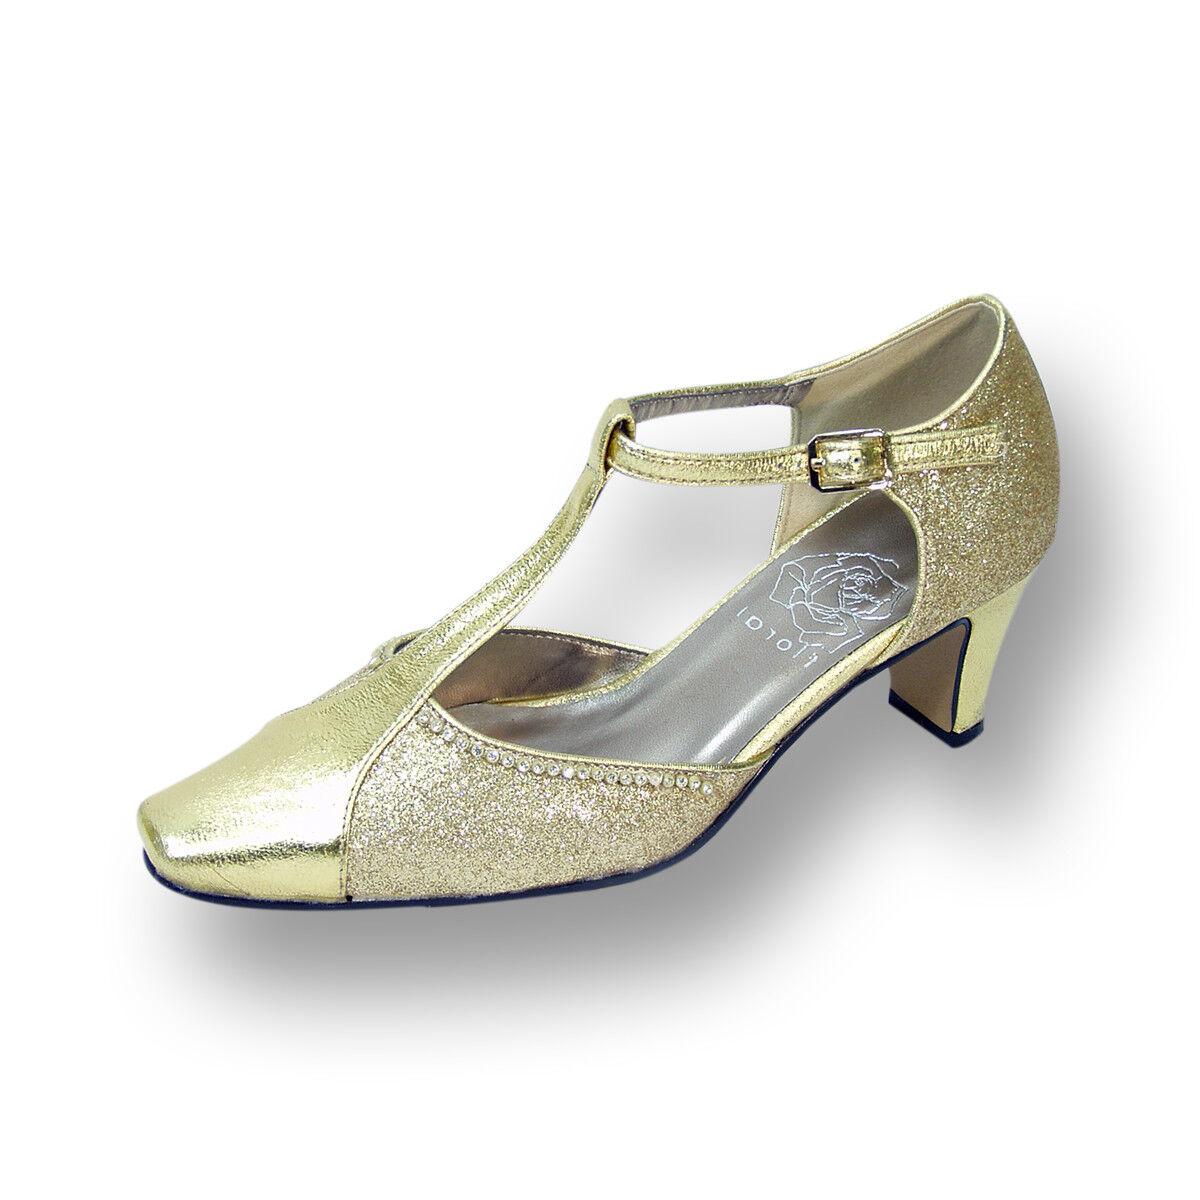 FLORAL Rosa Damens Wide Width Jewel Outlined Upper Closed Toe T-Strap Dress Pump